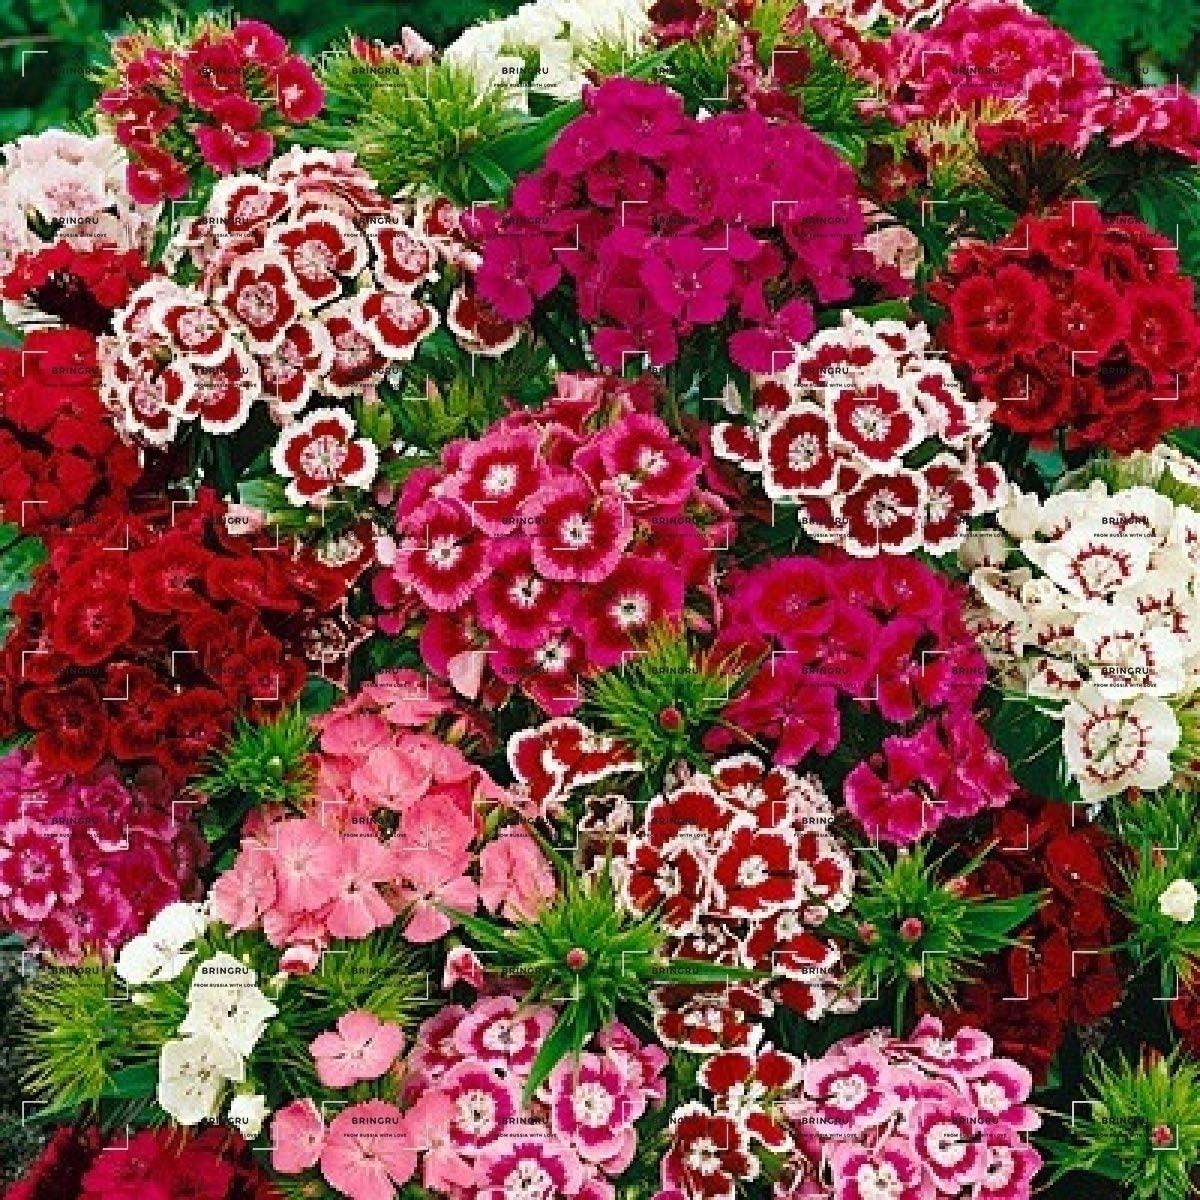 Flower Seeds Russian Carnation Turkish Mixed Coloring, Turkish Carnation Seeds from Russia